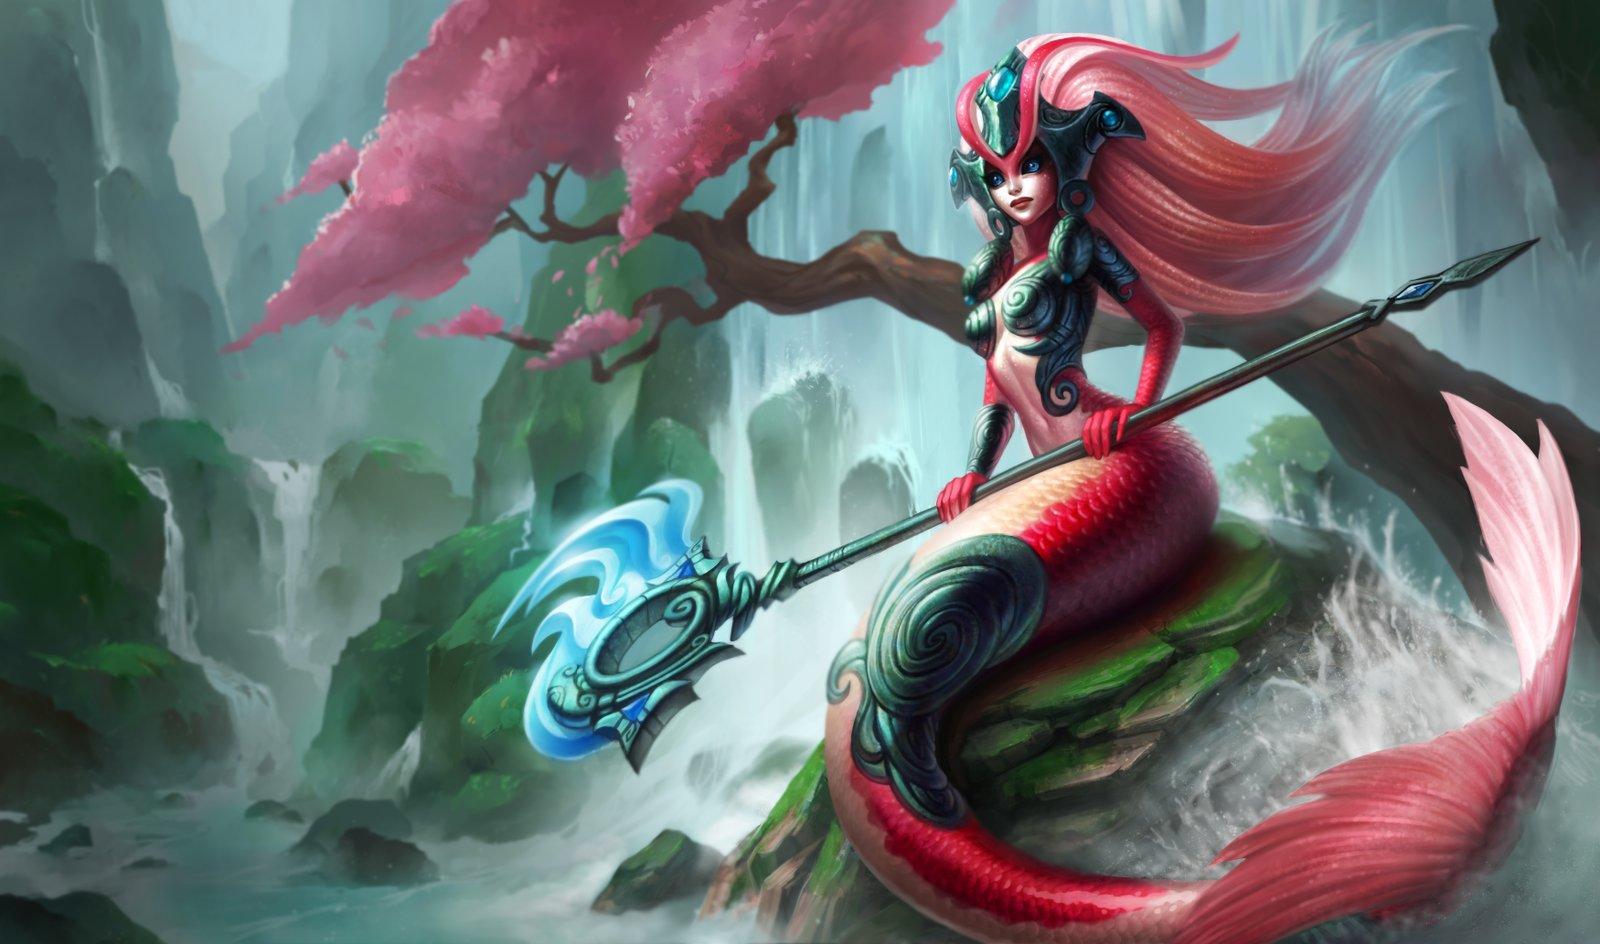 Koi Nami Splash Art 4k HD Wallpaper Official Artwork League of Legends lol